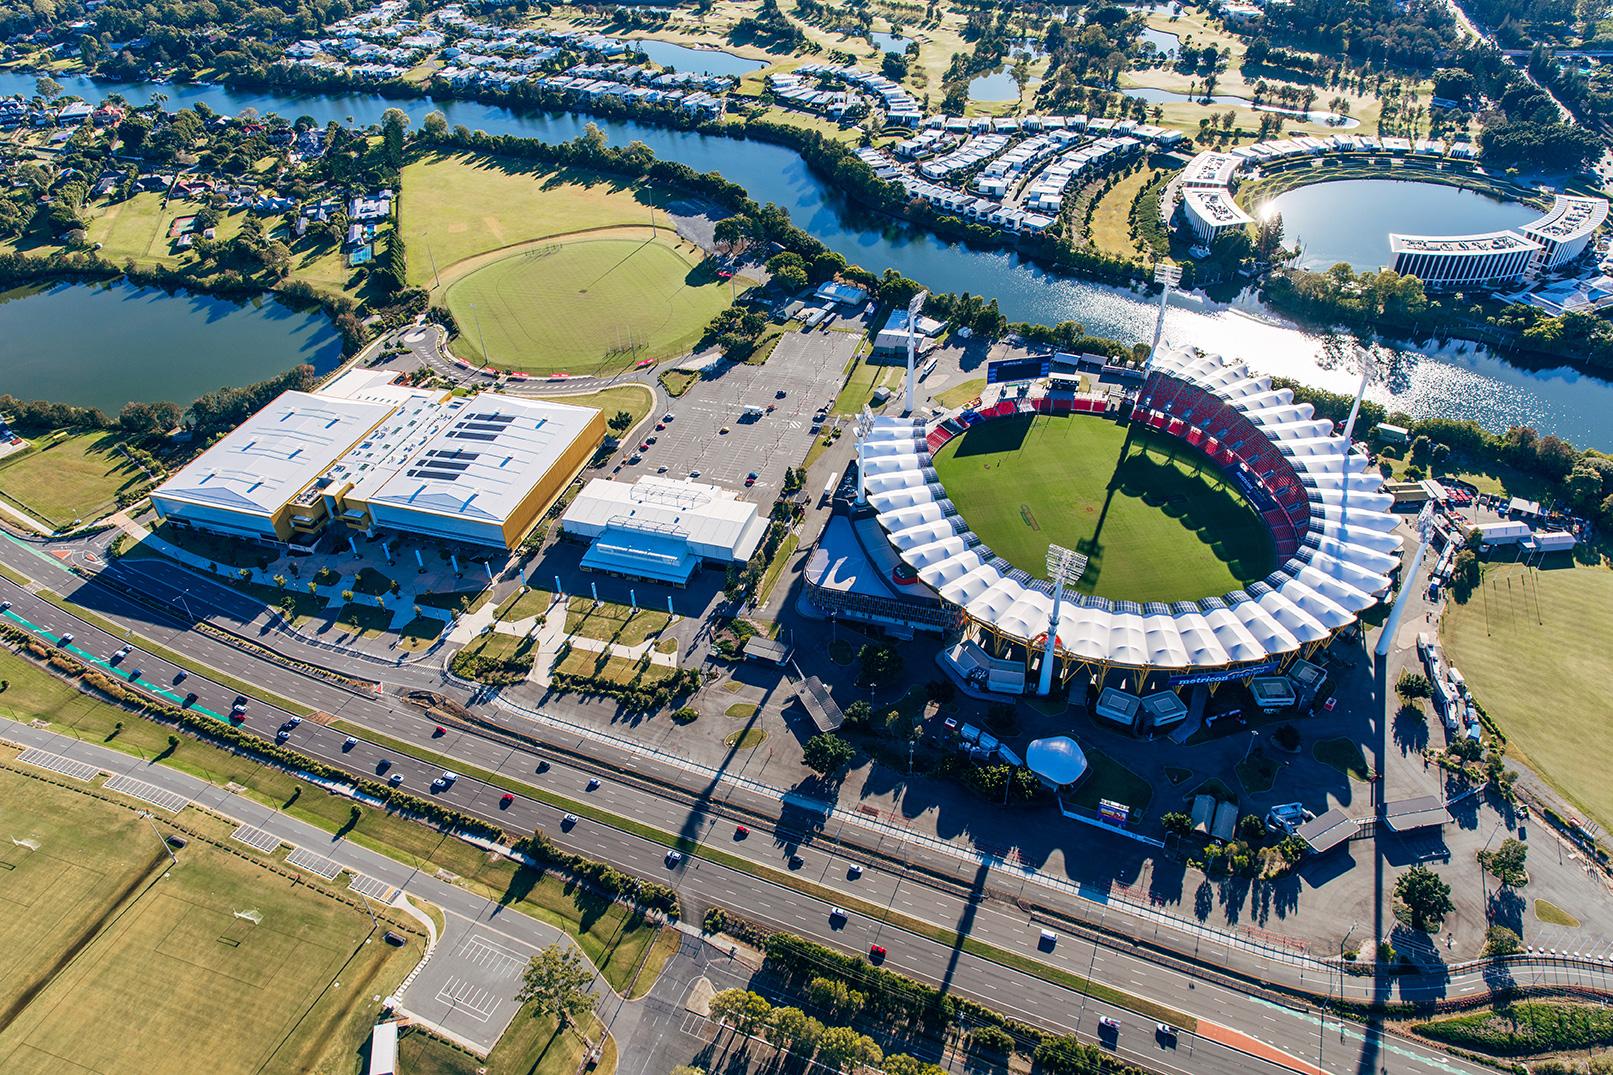 Carrara Sports precinct including Metricon stadium